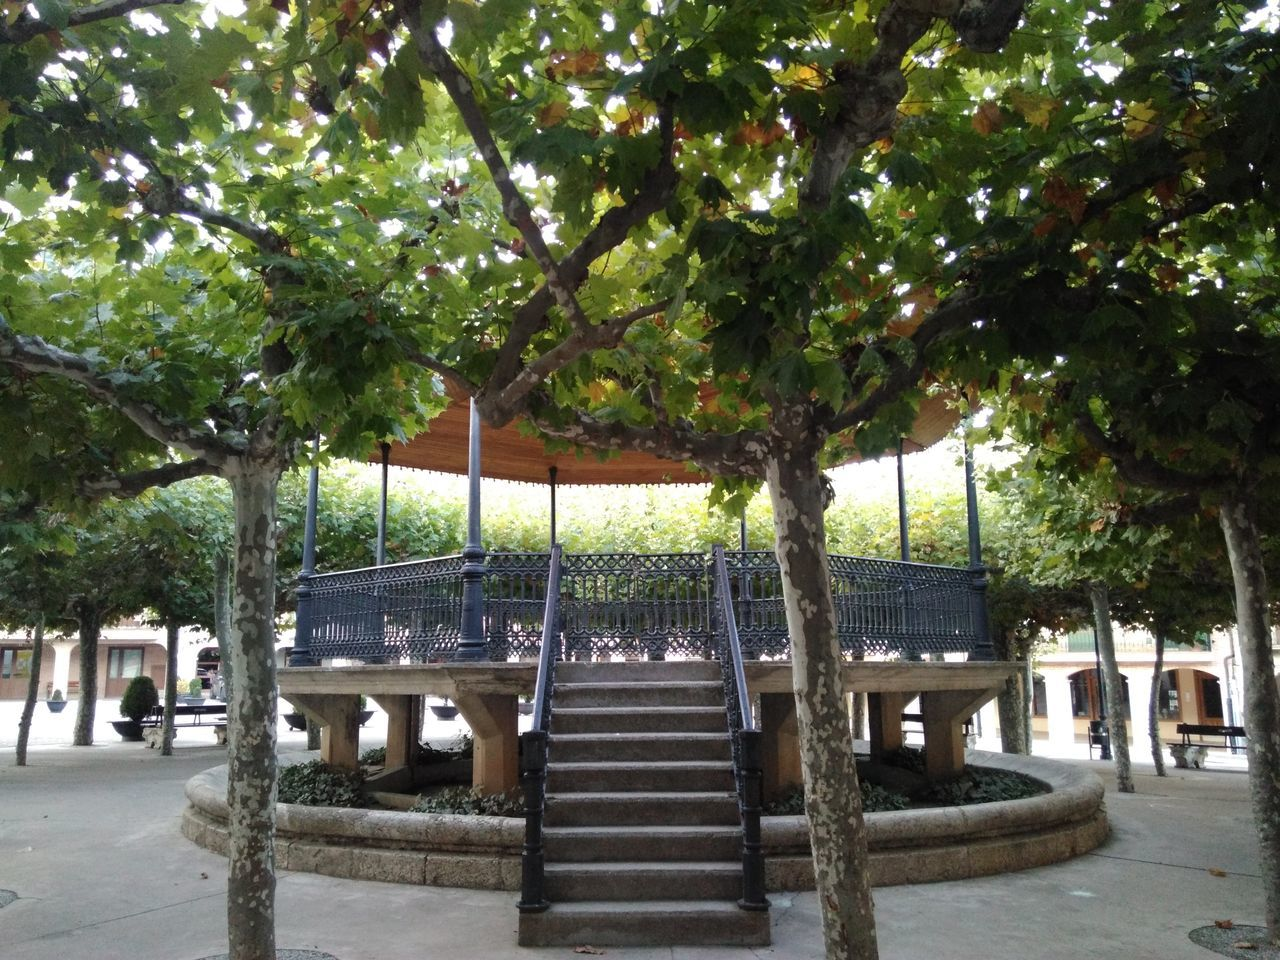 Belorado SPAIN Spanien Camino De Santiago CaminodeSantiago Camino Way Of Saint James Travel Reise Jakobsweg